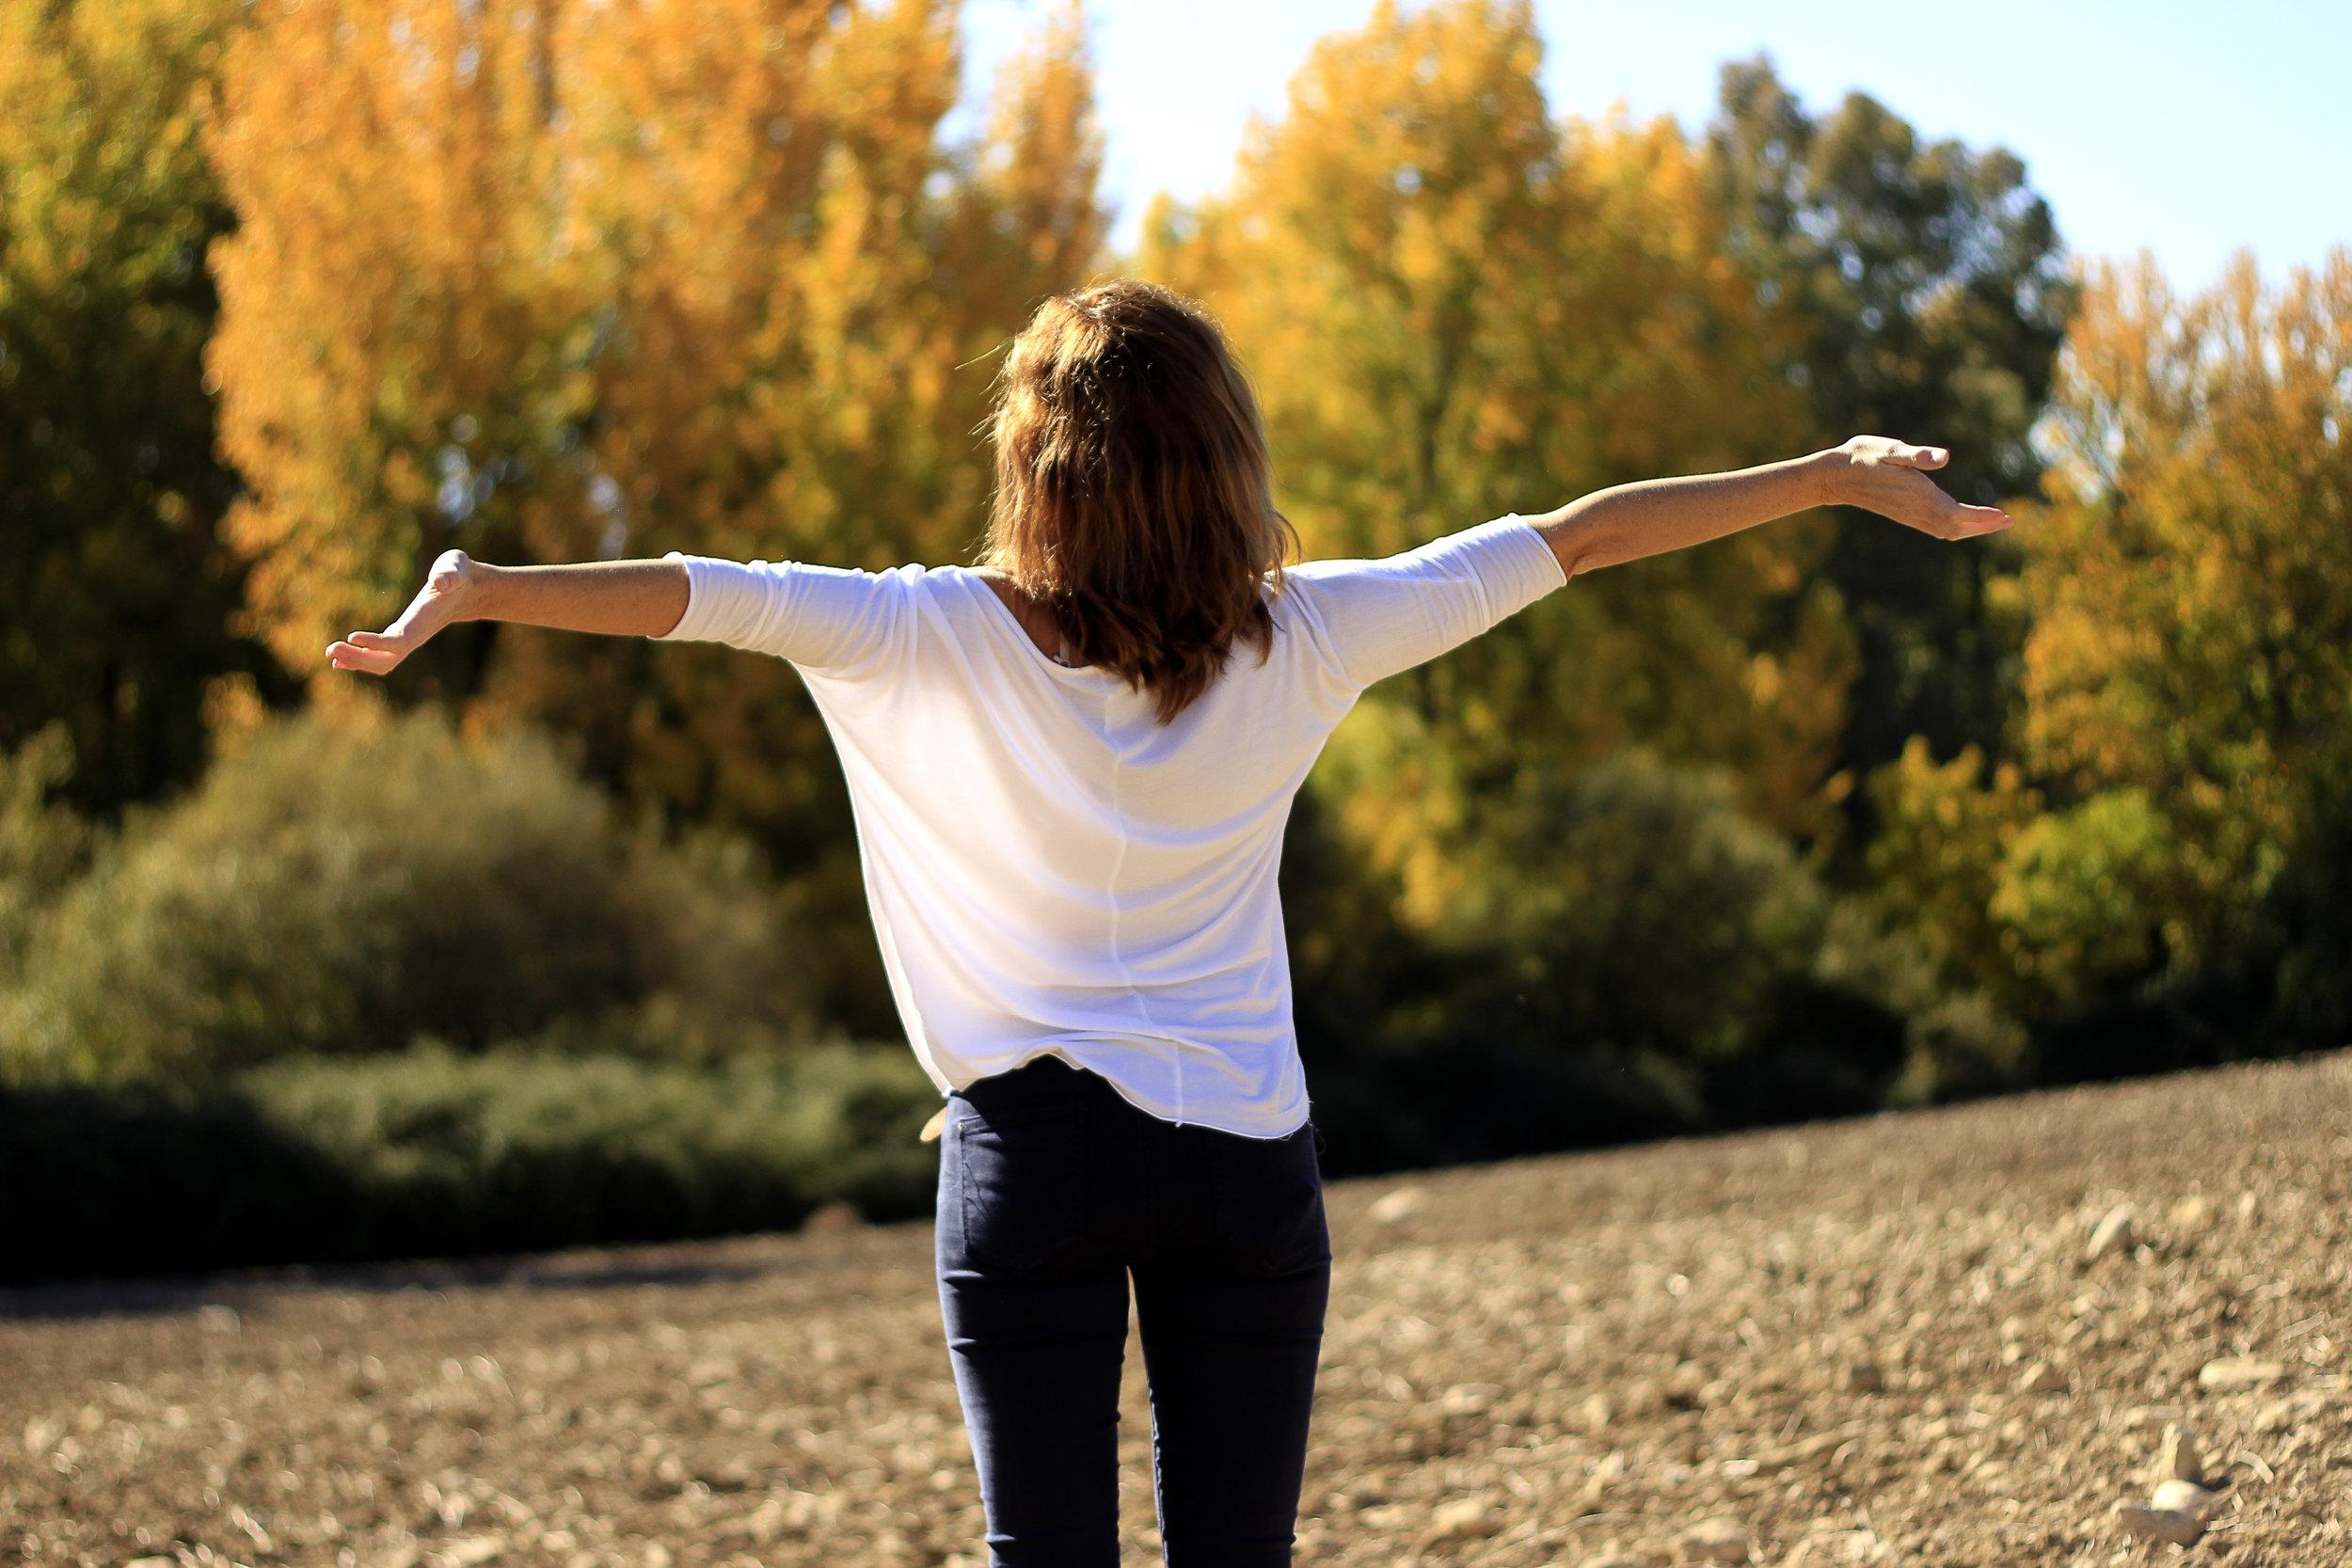 Canva - Happiness, Joy, Pure Air, Freedom, Enthusiasm.jpg